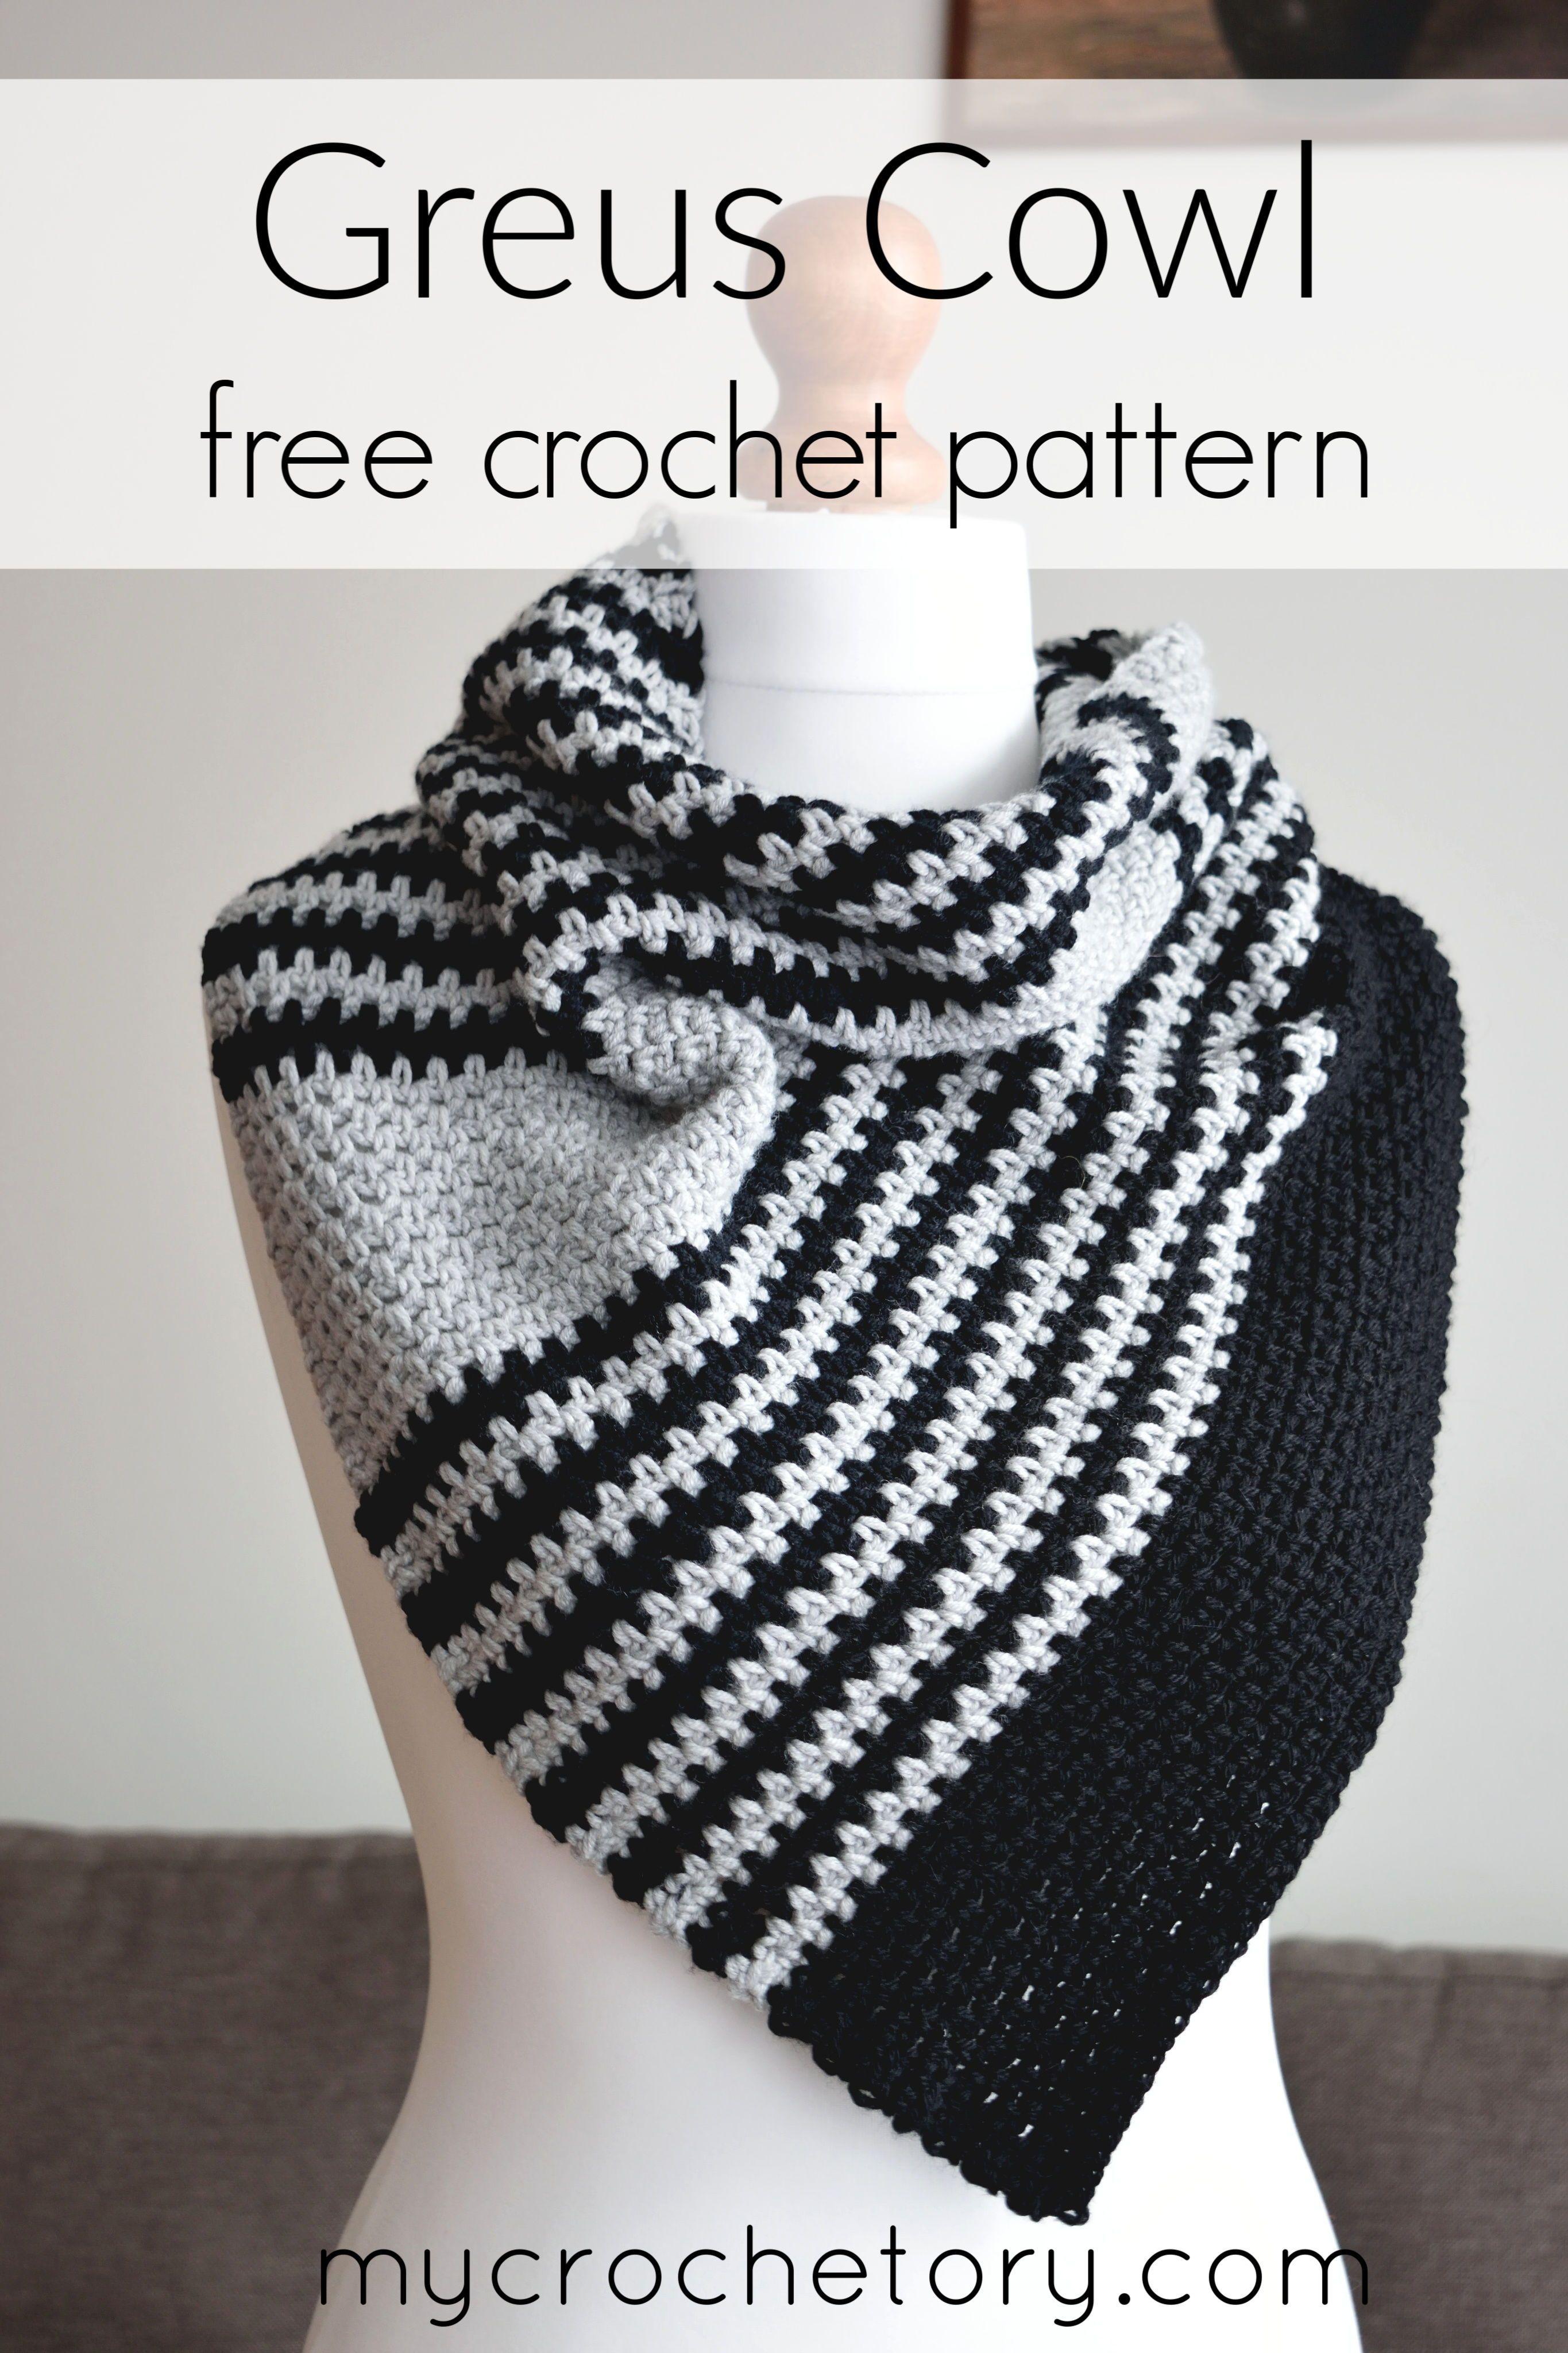 Crochet Greus Asymmetric Cowl - MyCrochetory